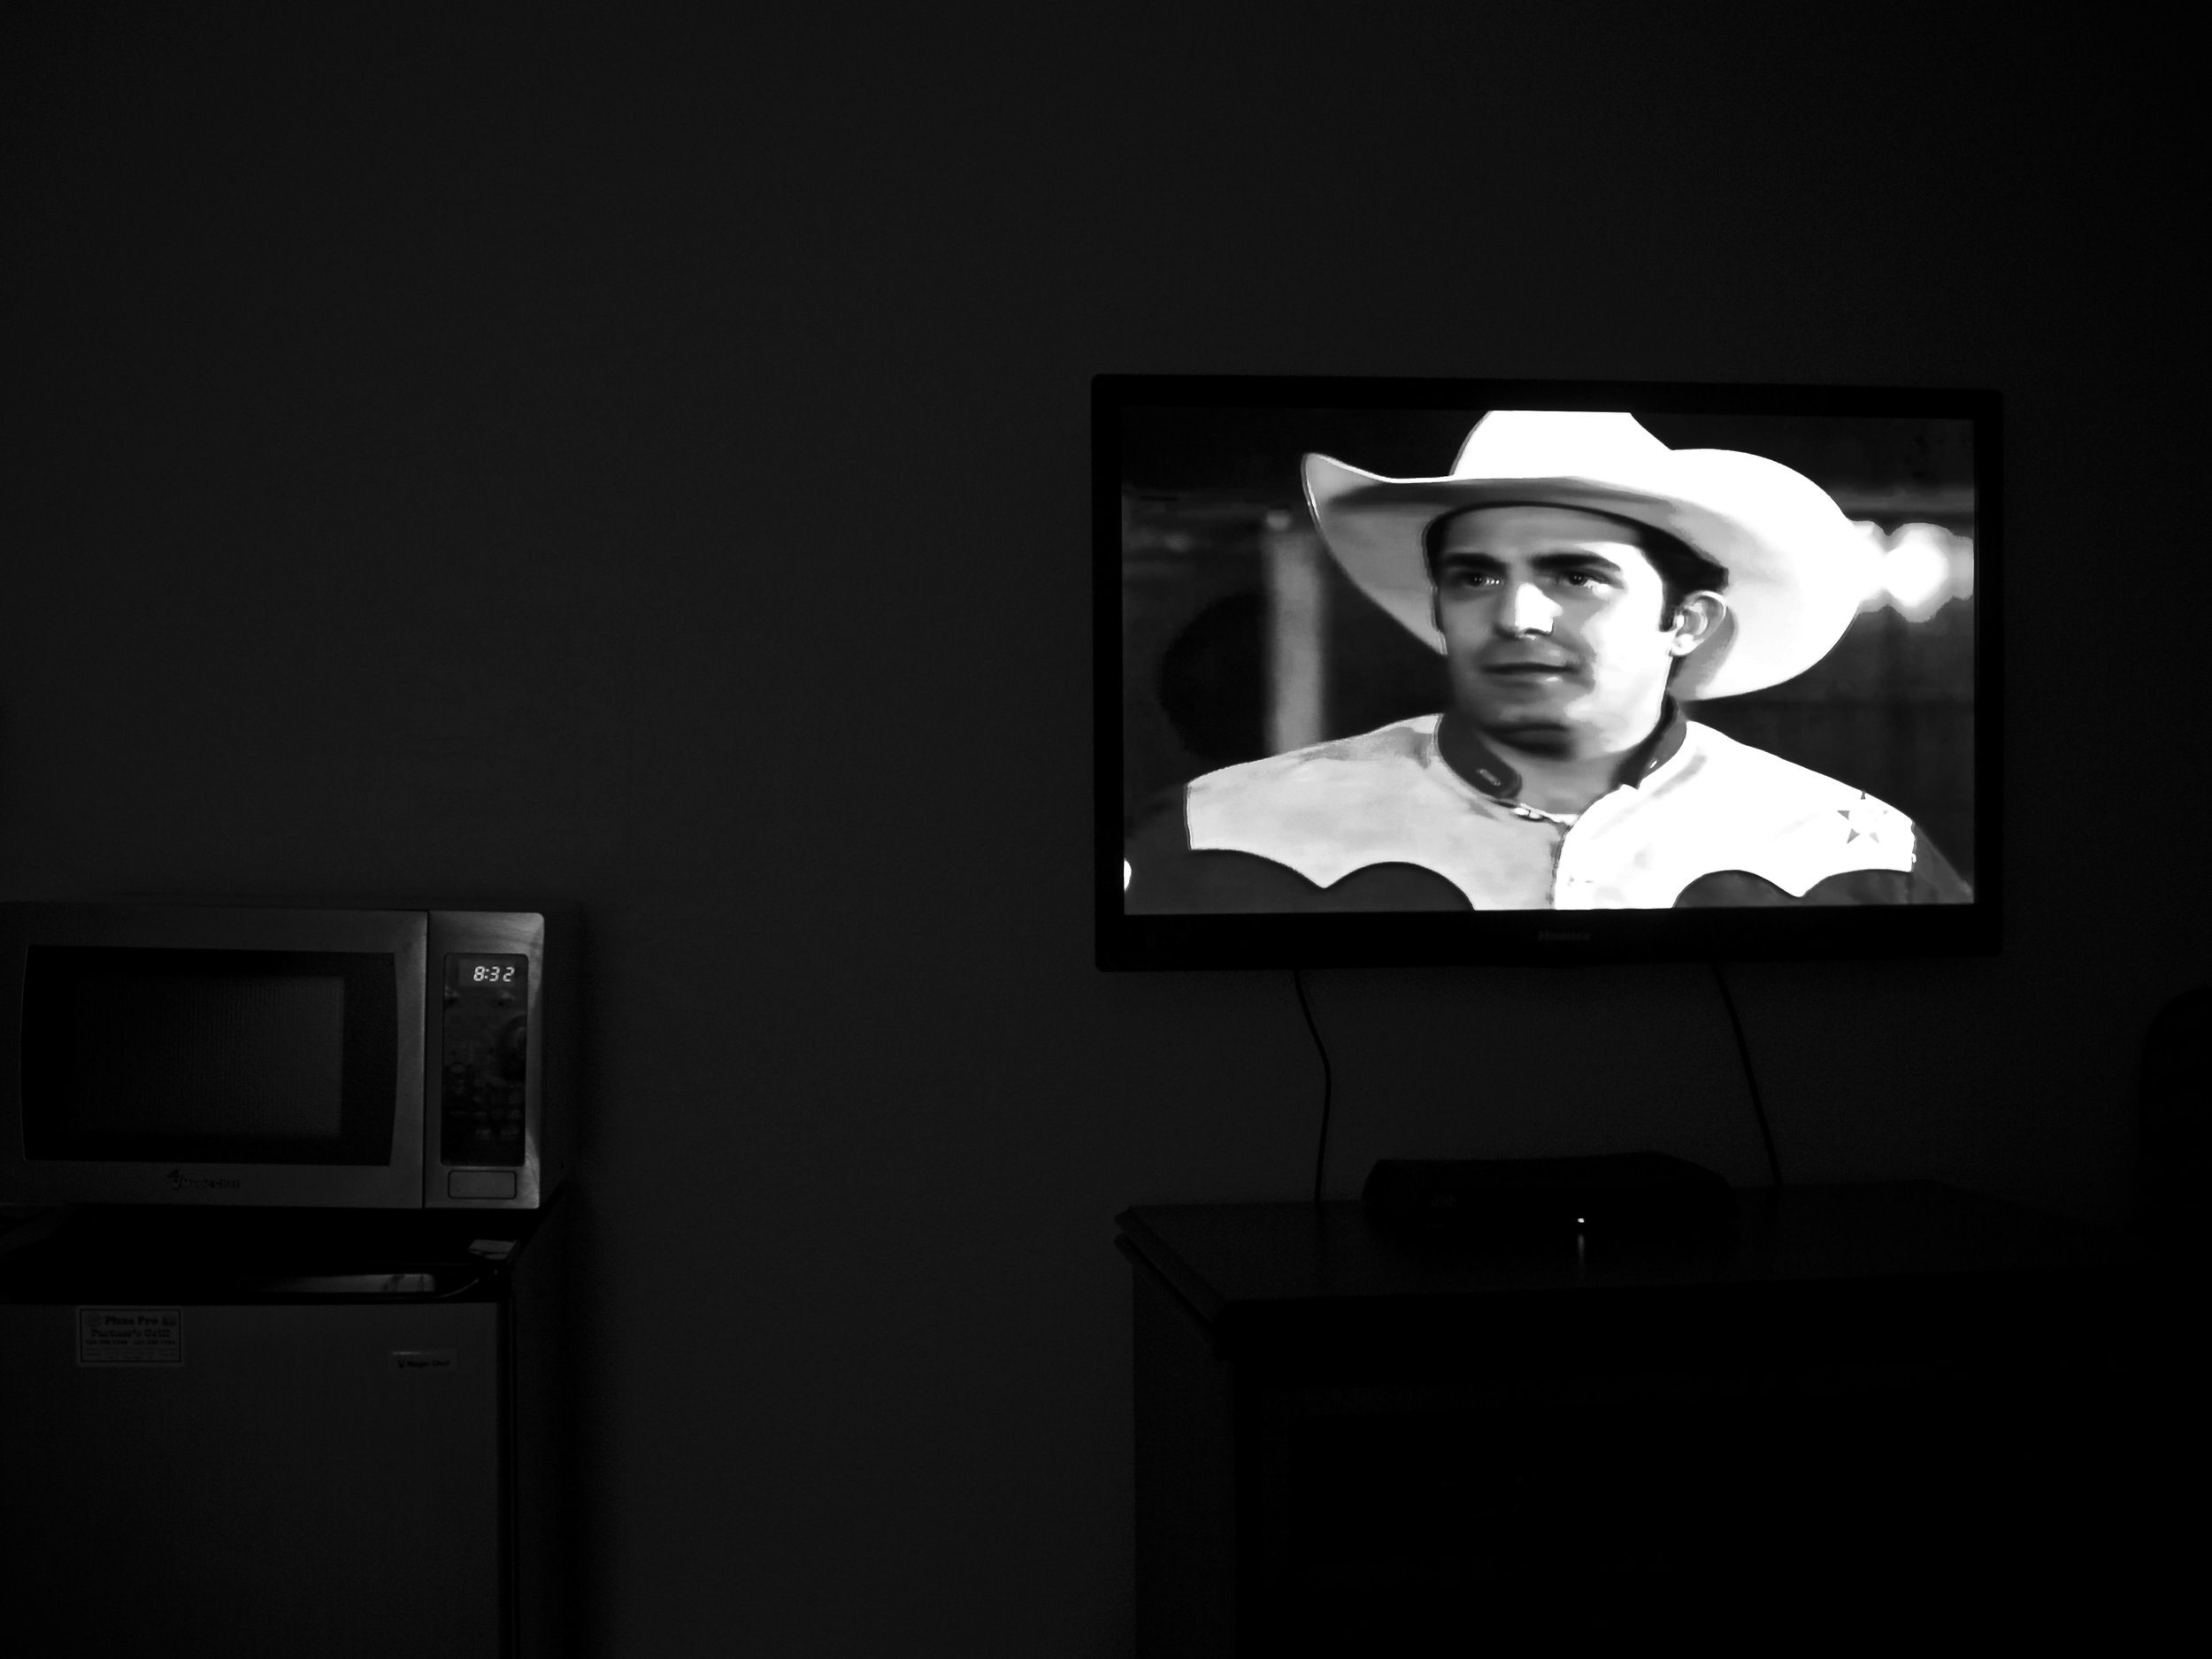 Cowboy_IMG_6928.jpg